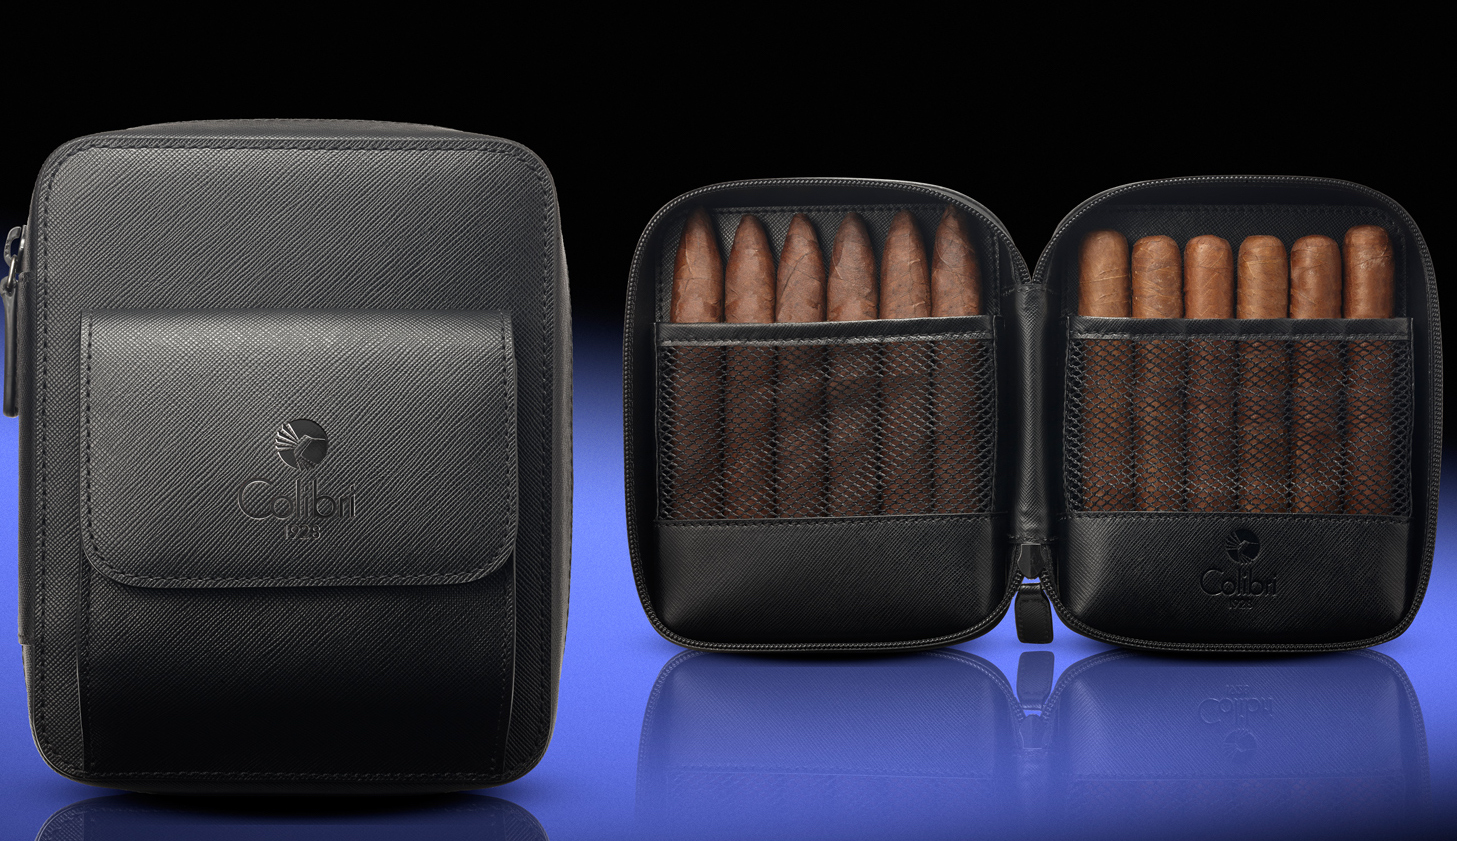 Cigar News: Colibri Explorer Travel Case to Debut at 2017 IPCPR